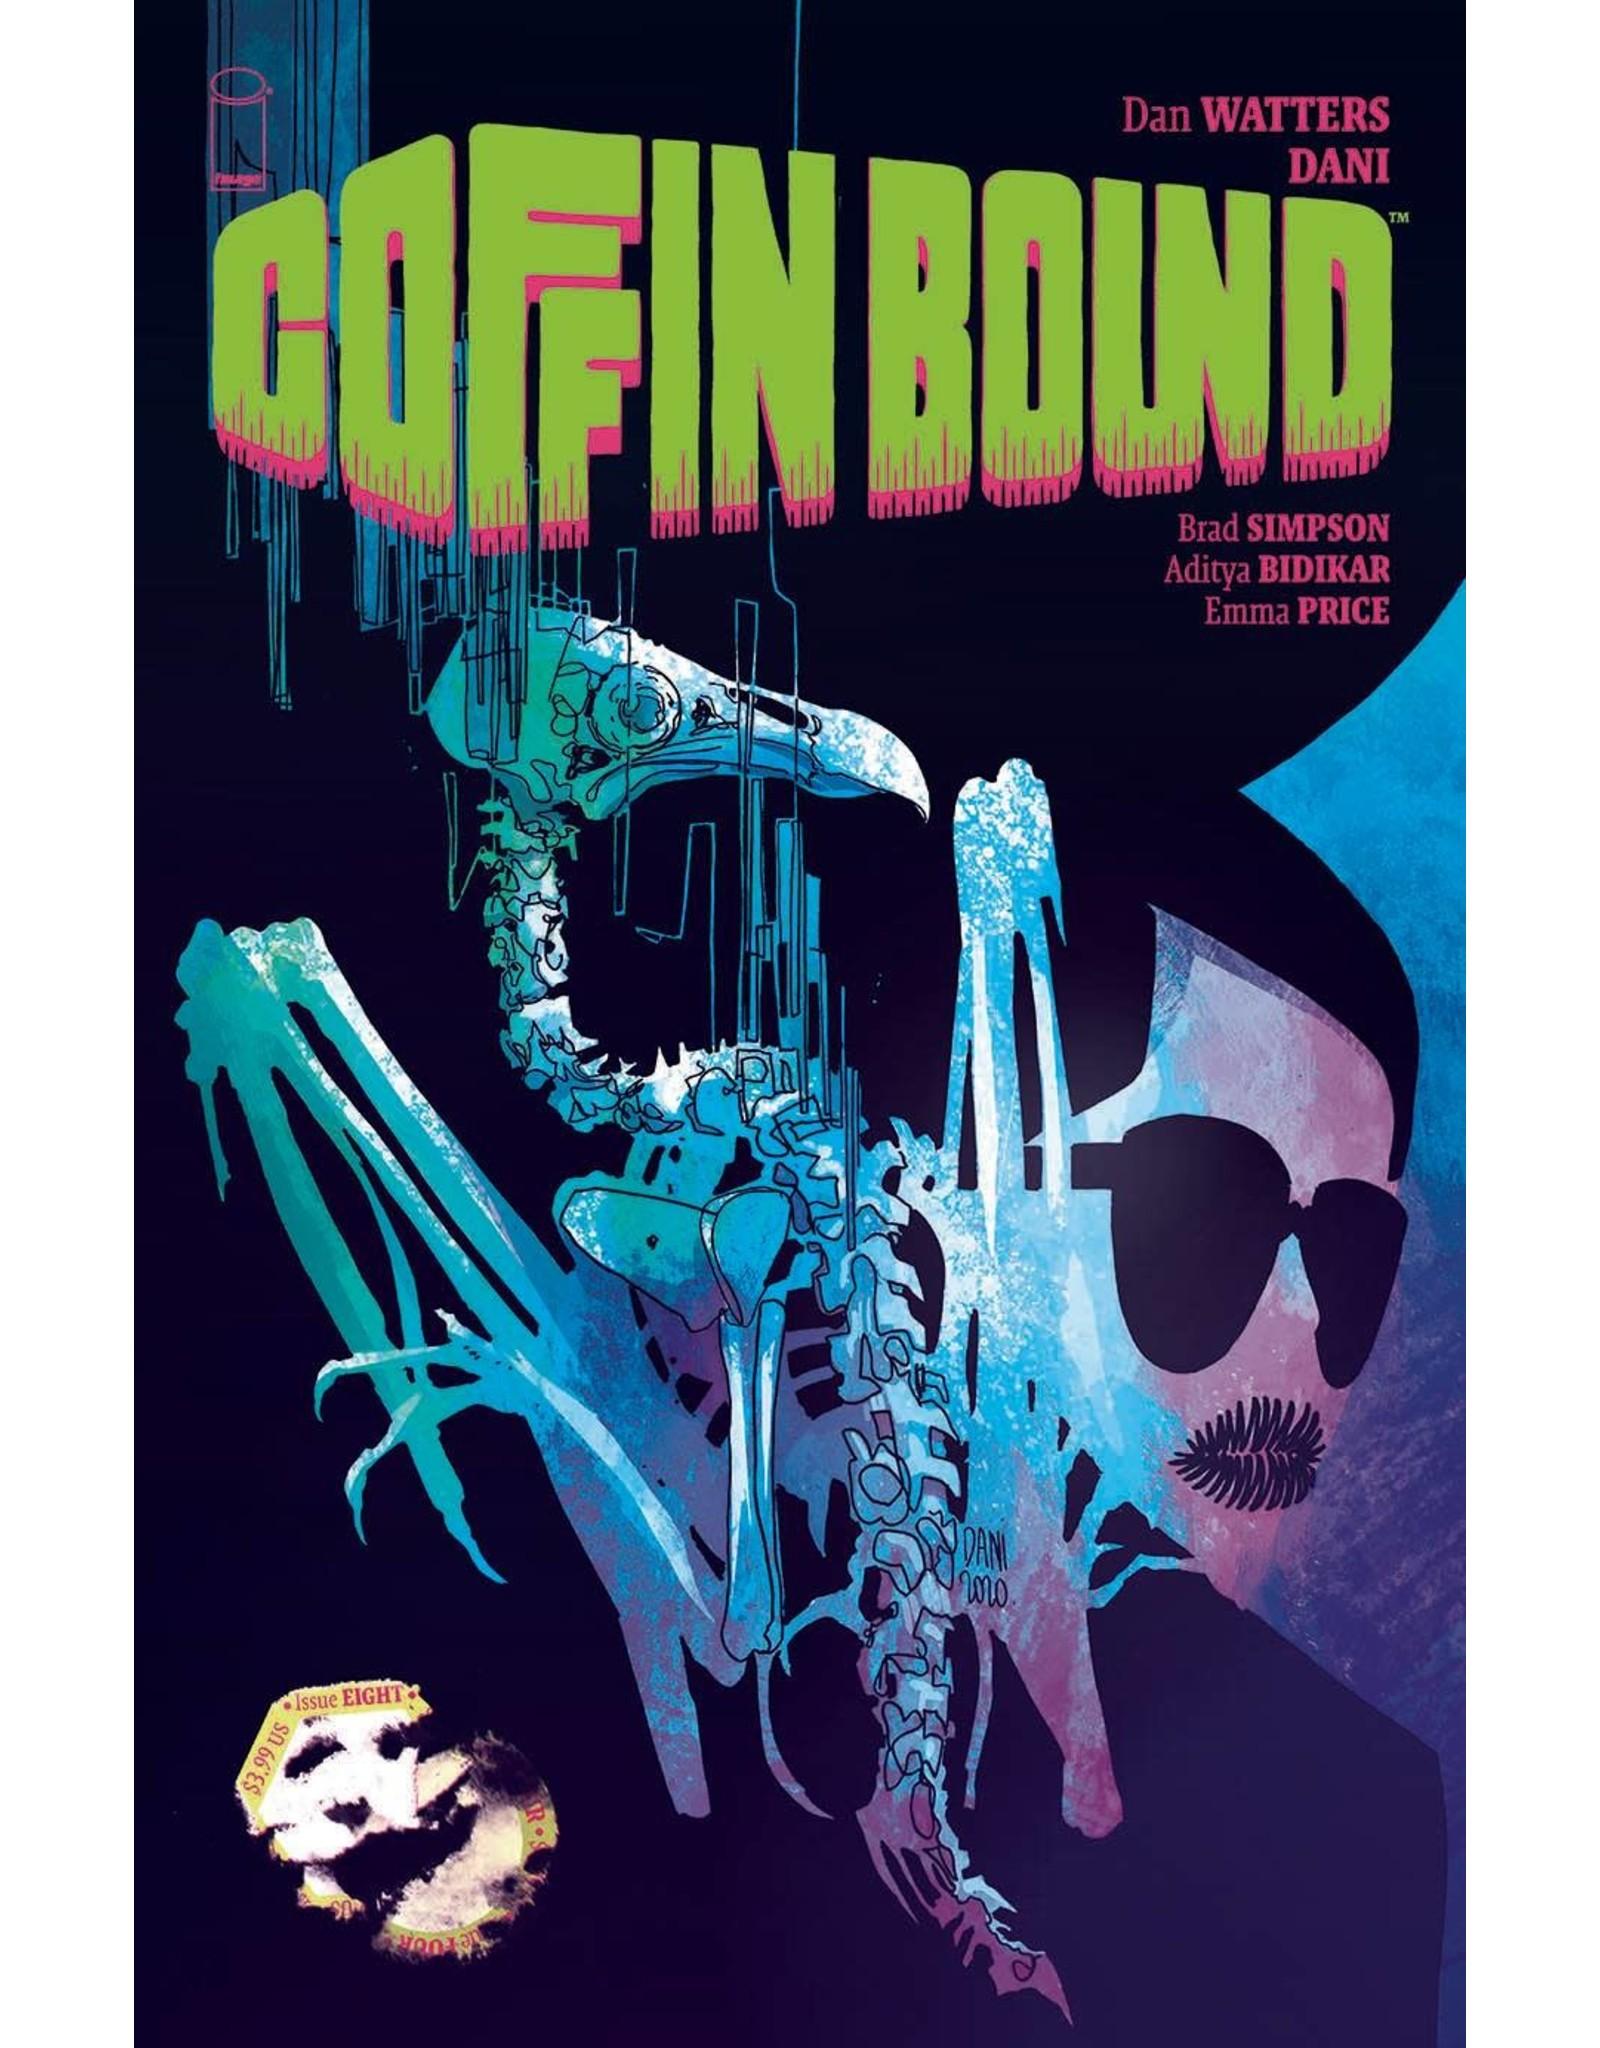 Image Comics COFFIN BOUND #8 (MR)